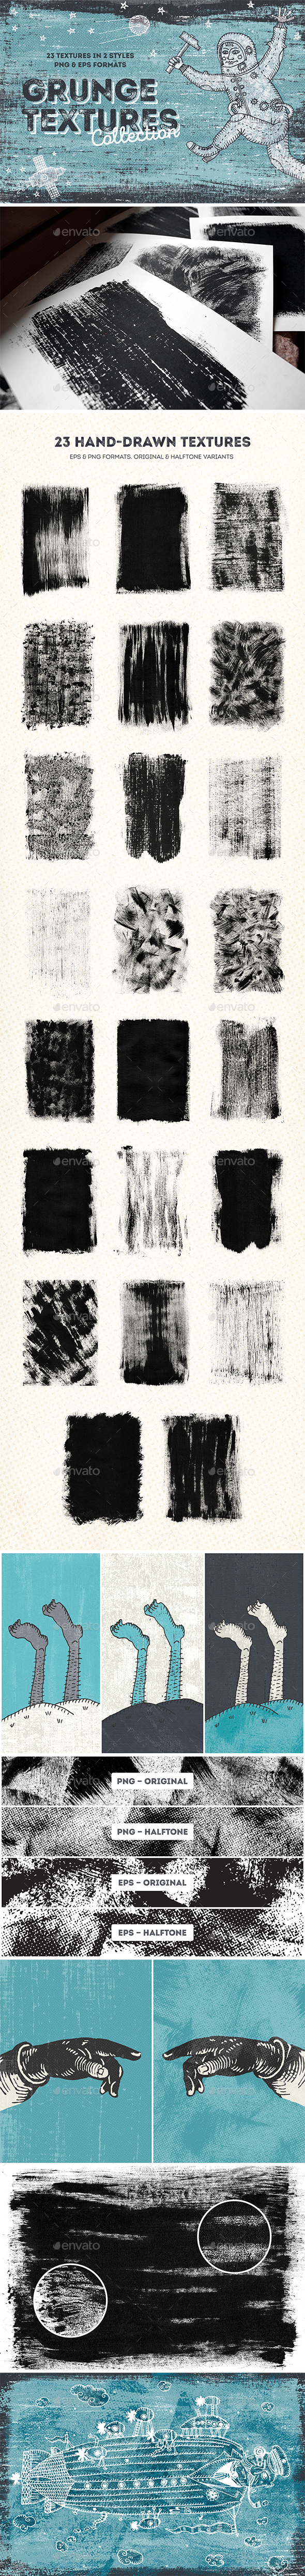 Blackview Retro Textures Collection - Art Textures